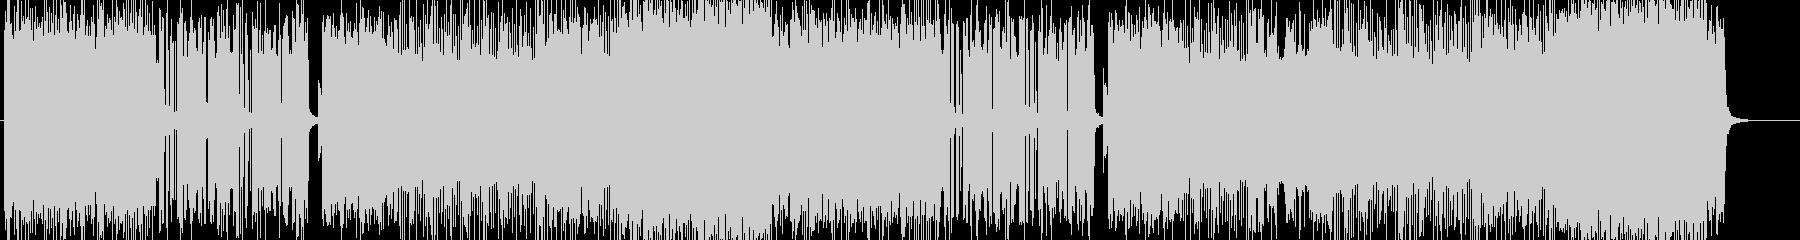 「HR/HM」「DARK系」BGM28の未再生の波形